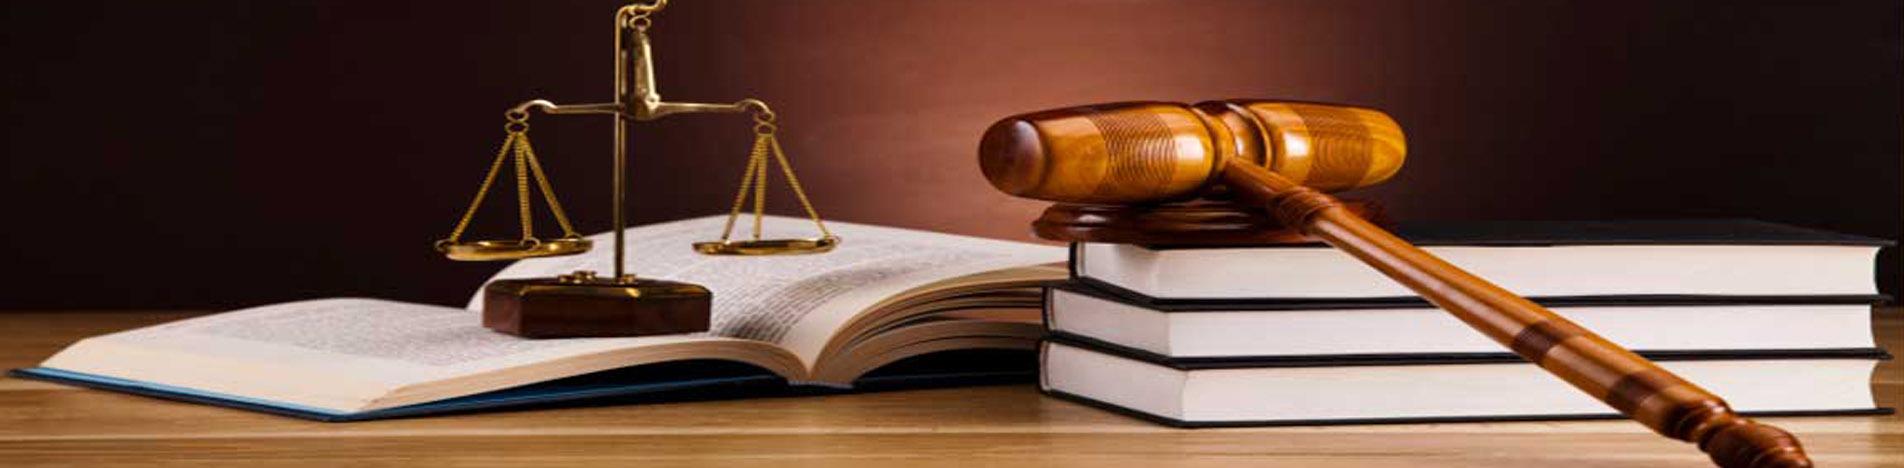 İcra ve İflas Hukuku